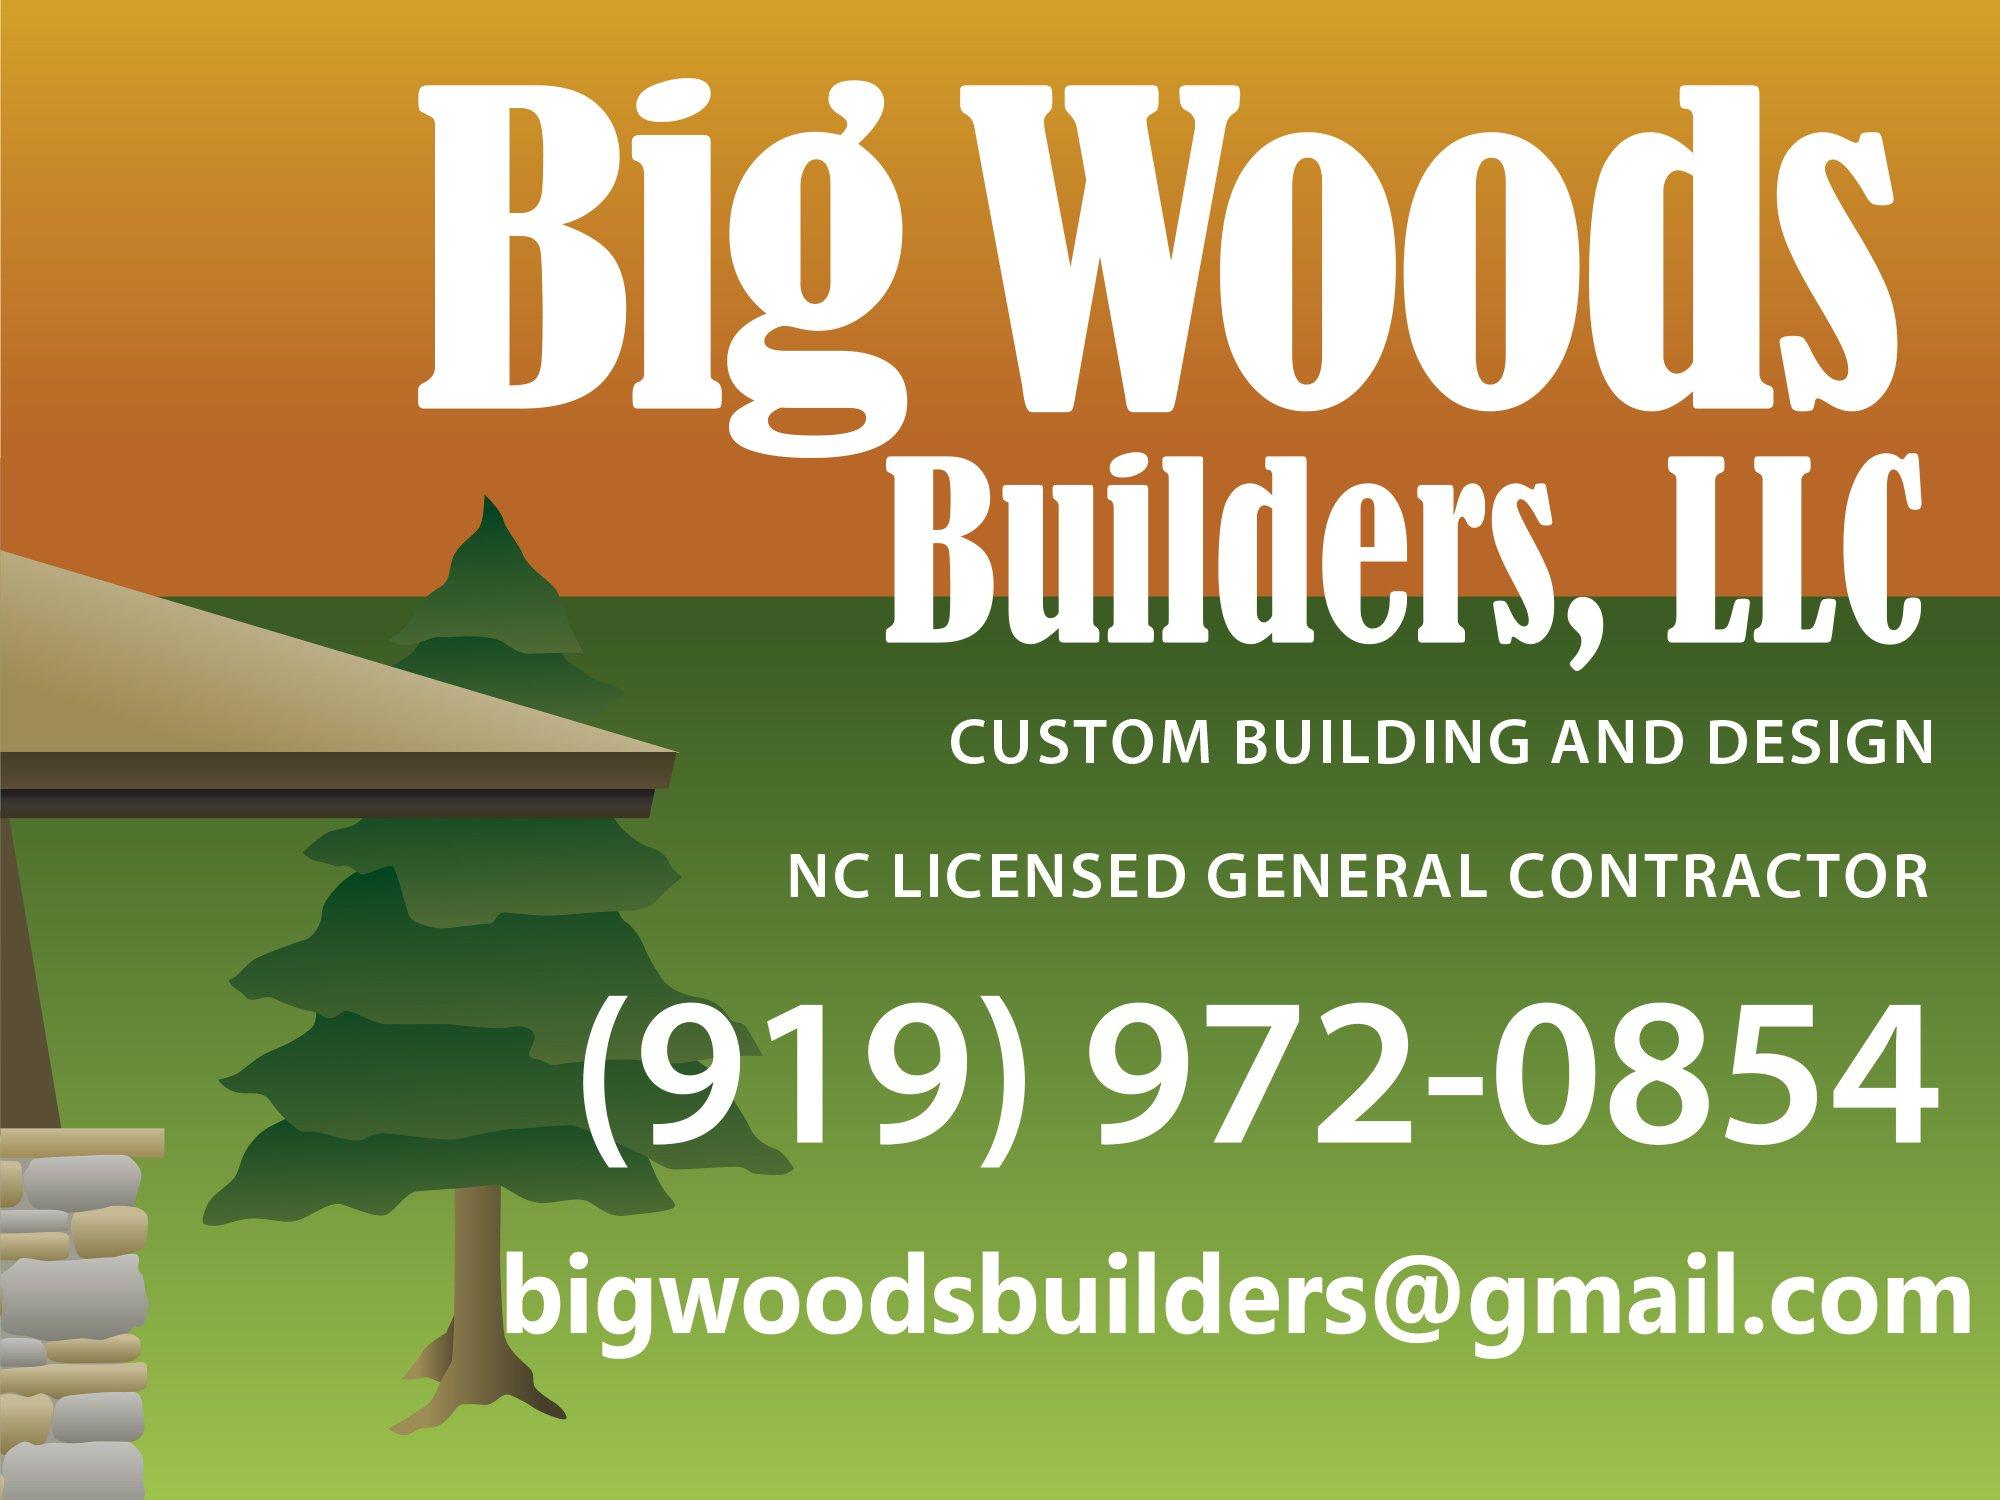 Big Woods Builders, LLC